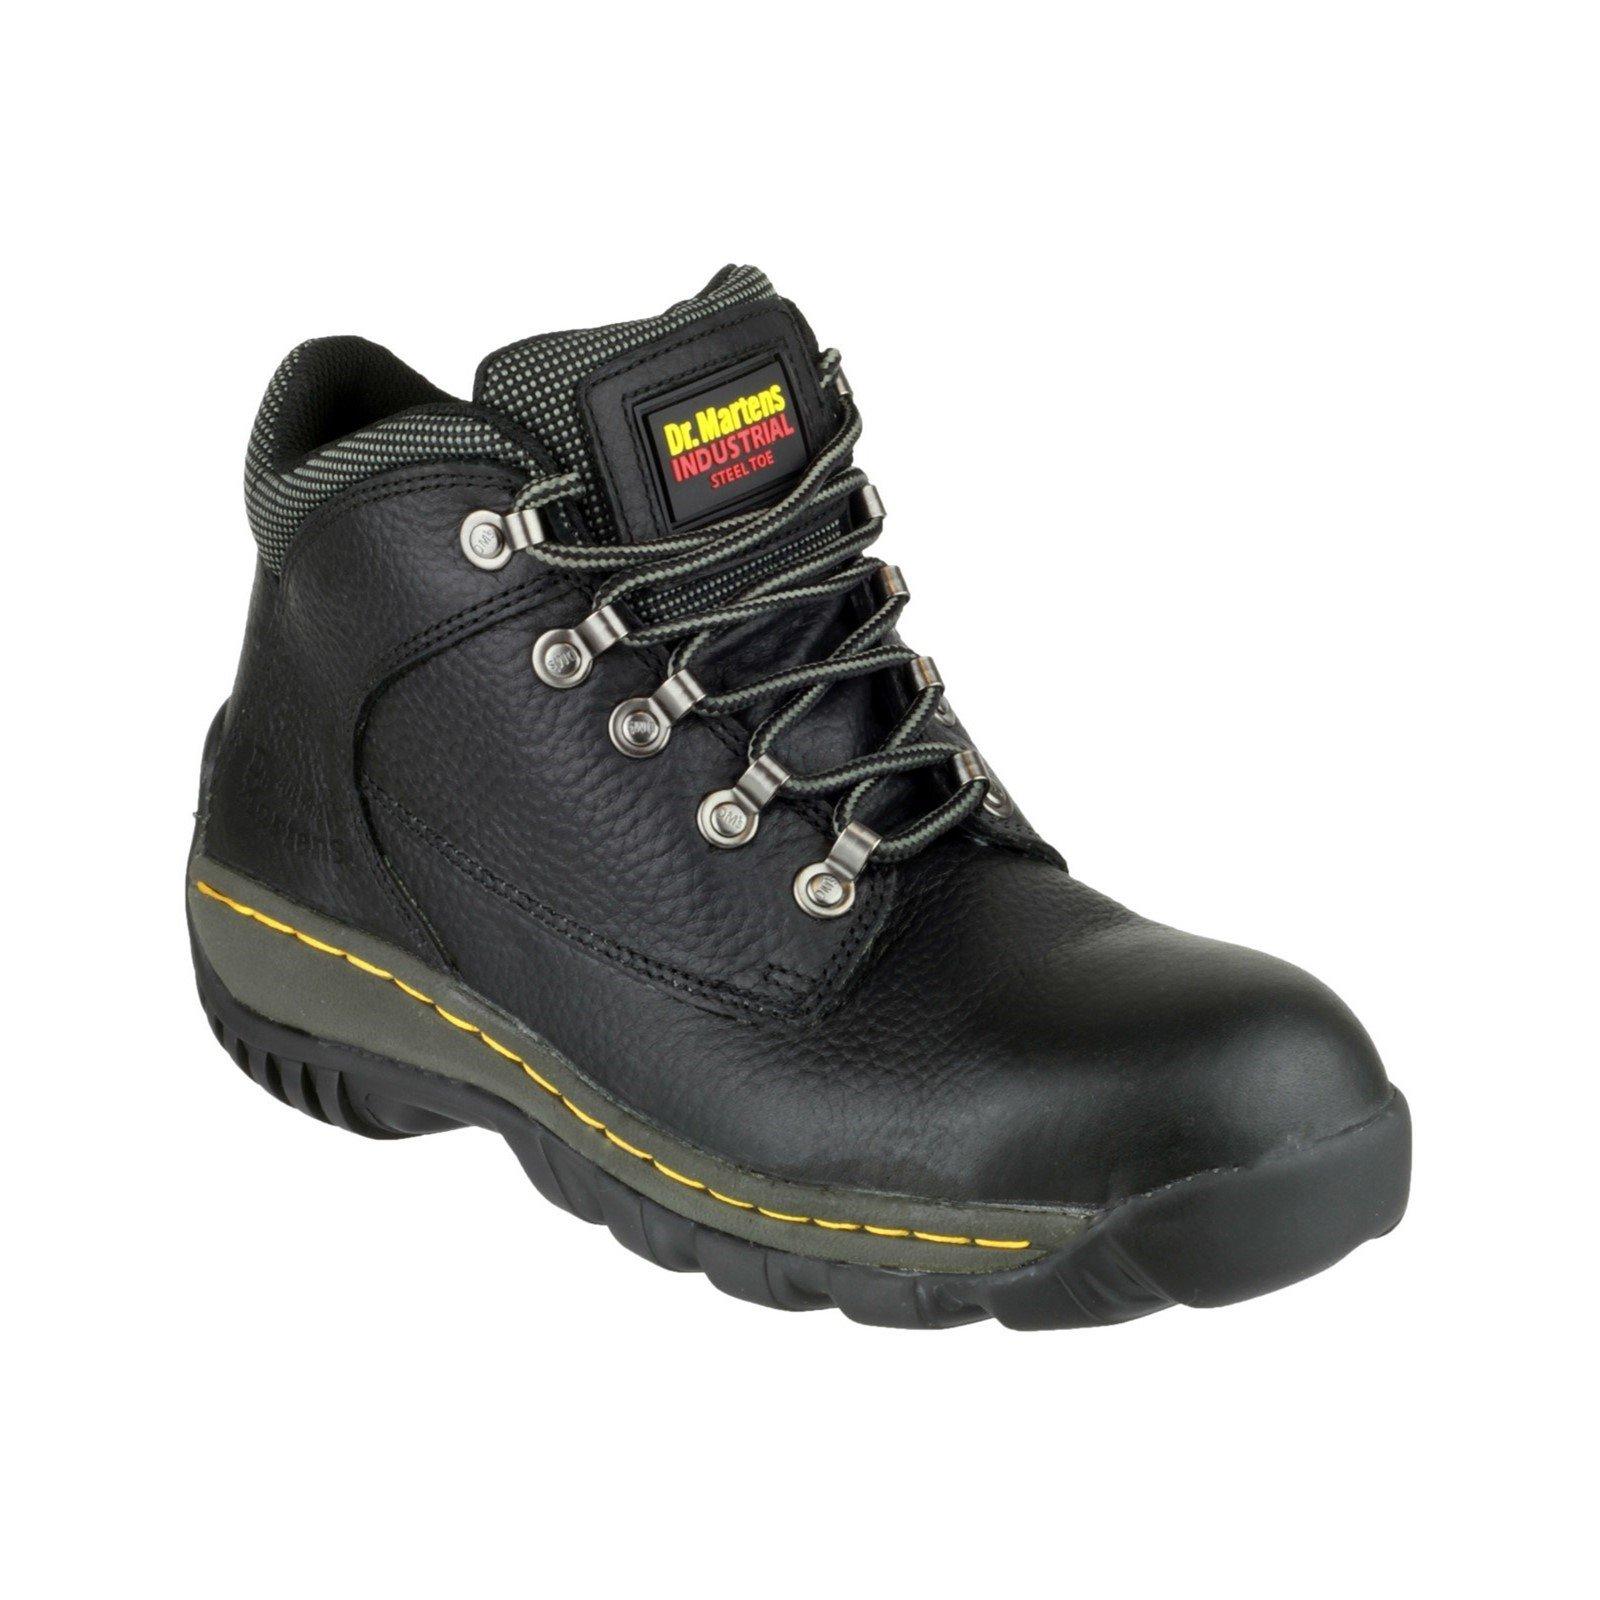 Dr Martens Unisex Lace-Up Boot Black 05207 - Black 12